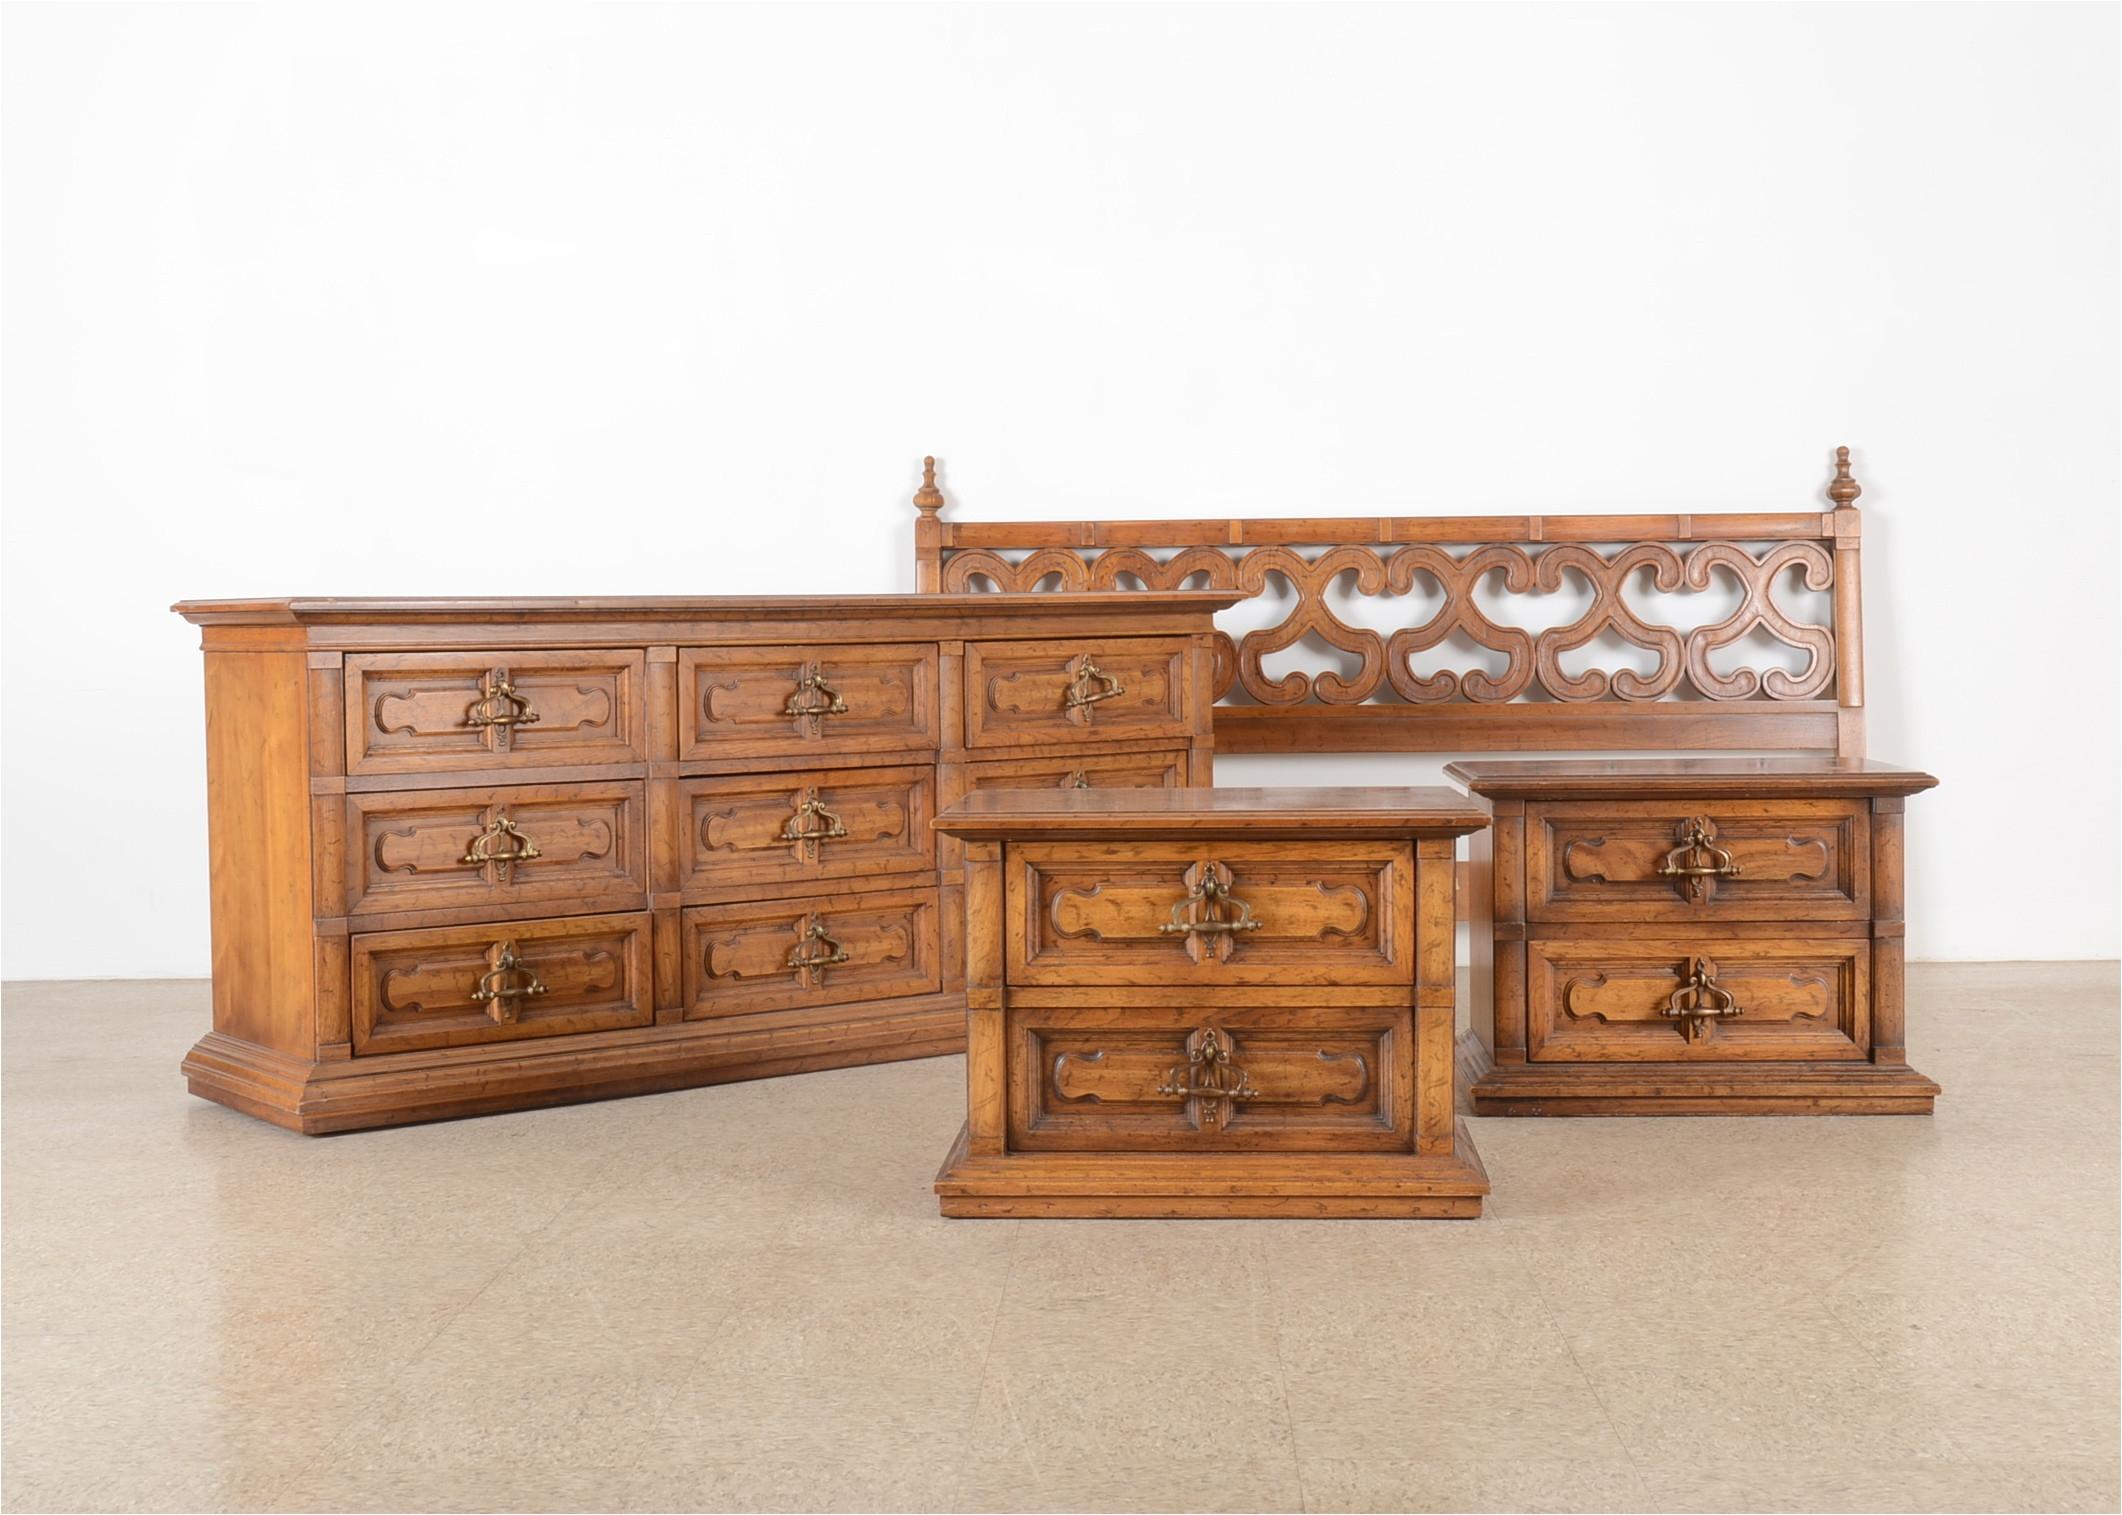 Drexel Furniture Company Drexel Furniture Vintage Prices Best Of Vintage Drexel Furniture